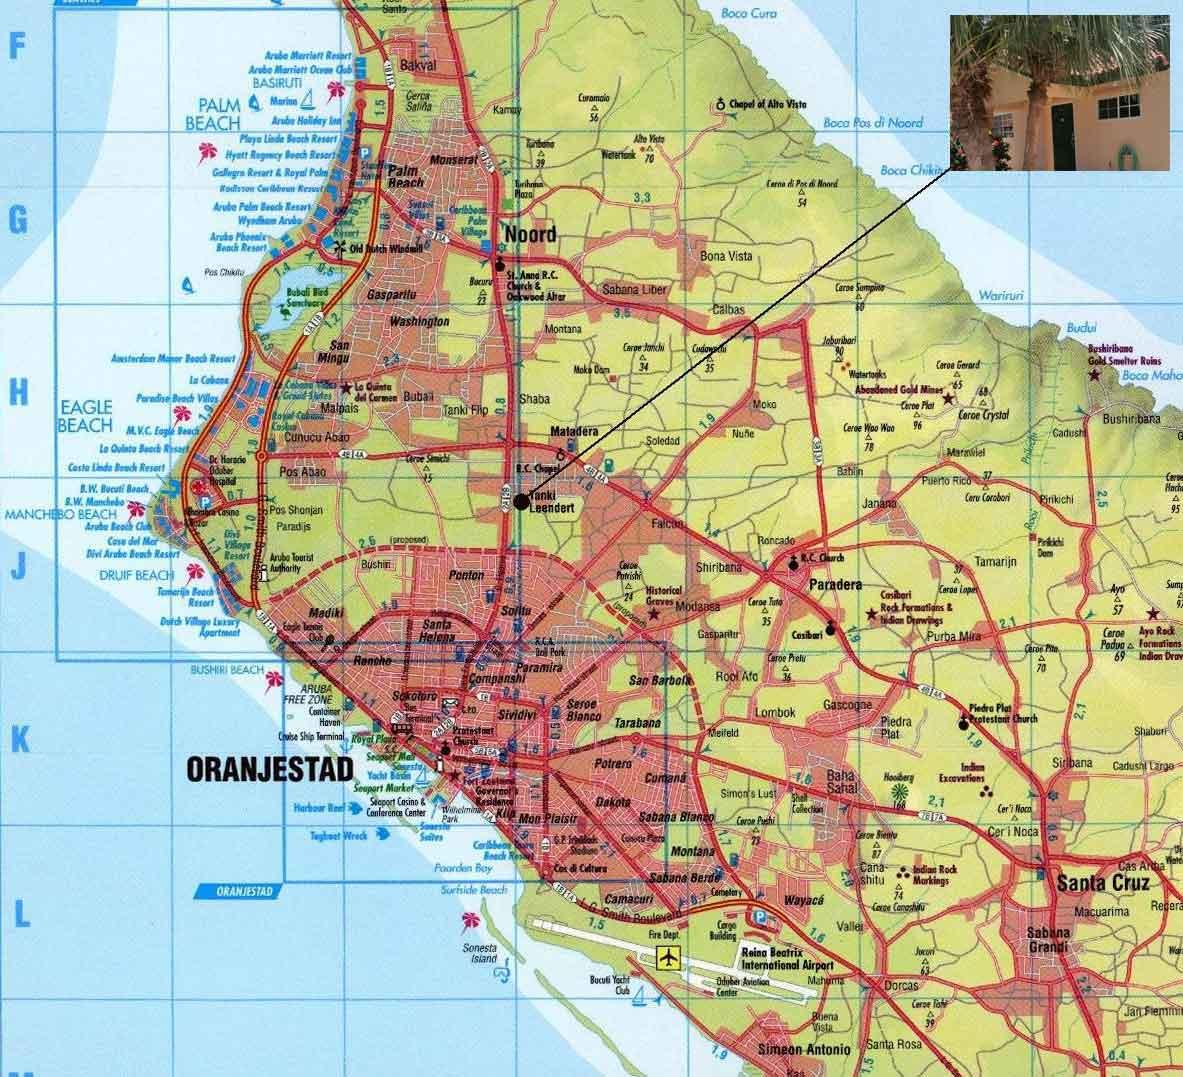 Vakantiewoning Aruba kaart2 - OMGEVING